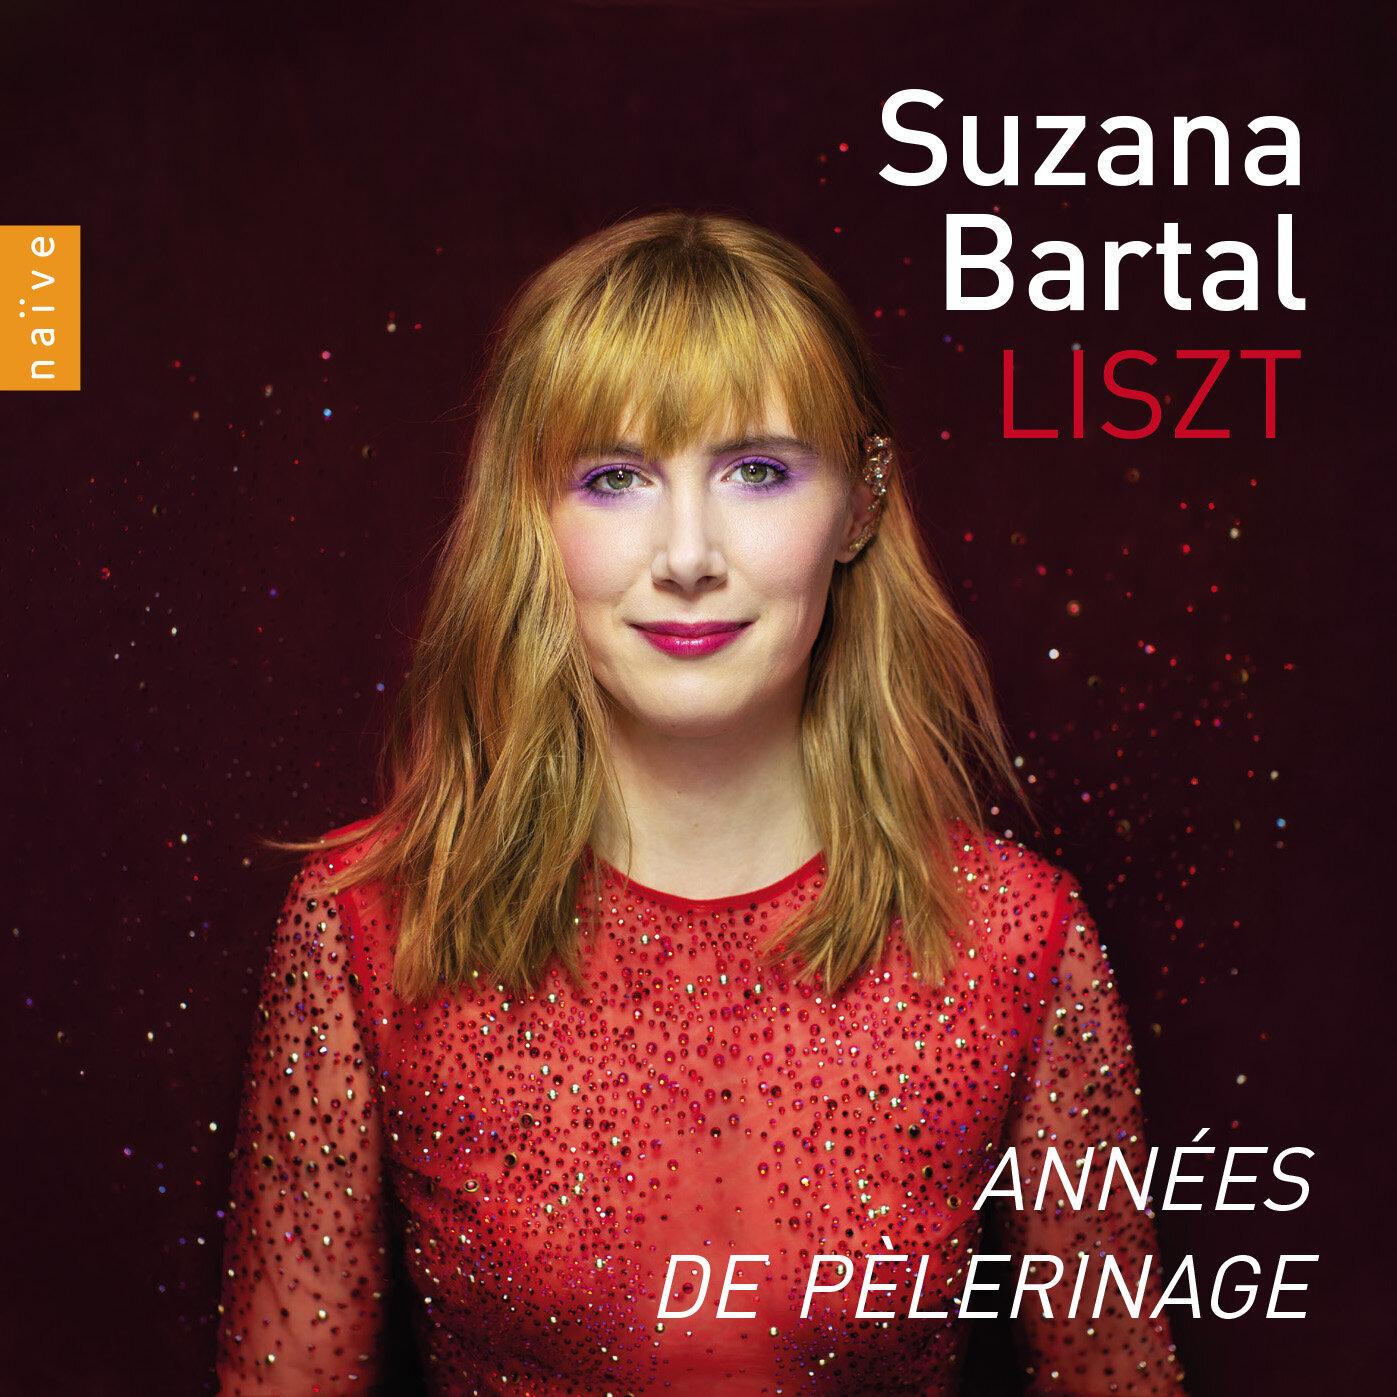 V7082 K Liszt Suzana Bartal.jpg